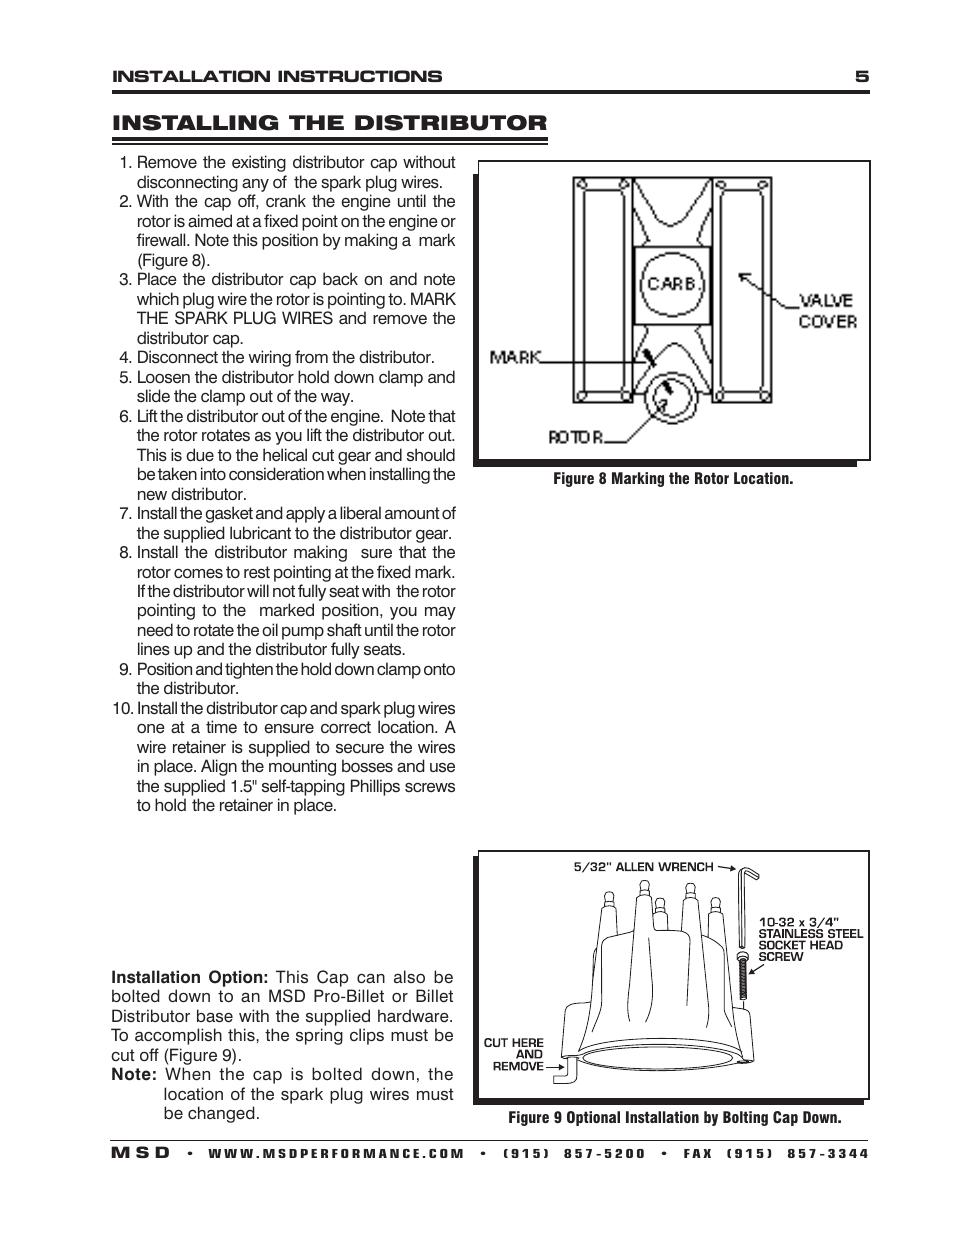 MSD 8363 Cadillac V8 Distributor w_Vacuum Advance Installation User Manual  | Page 5 / 8